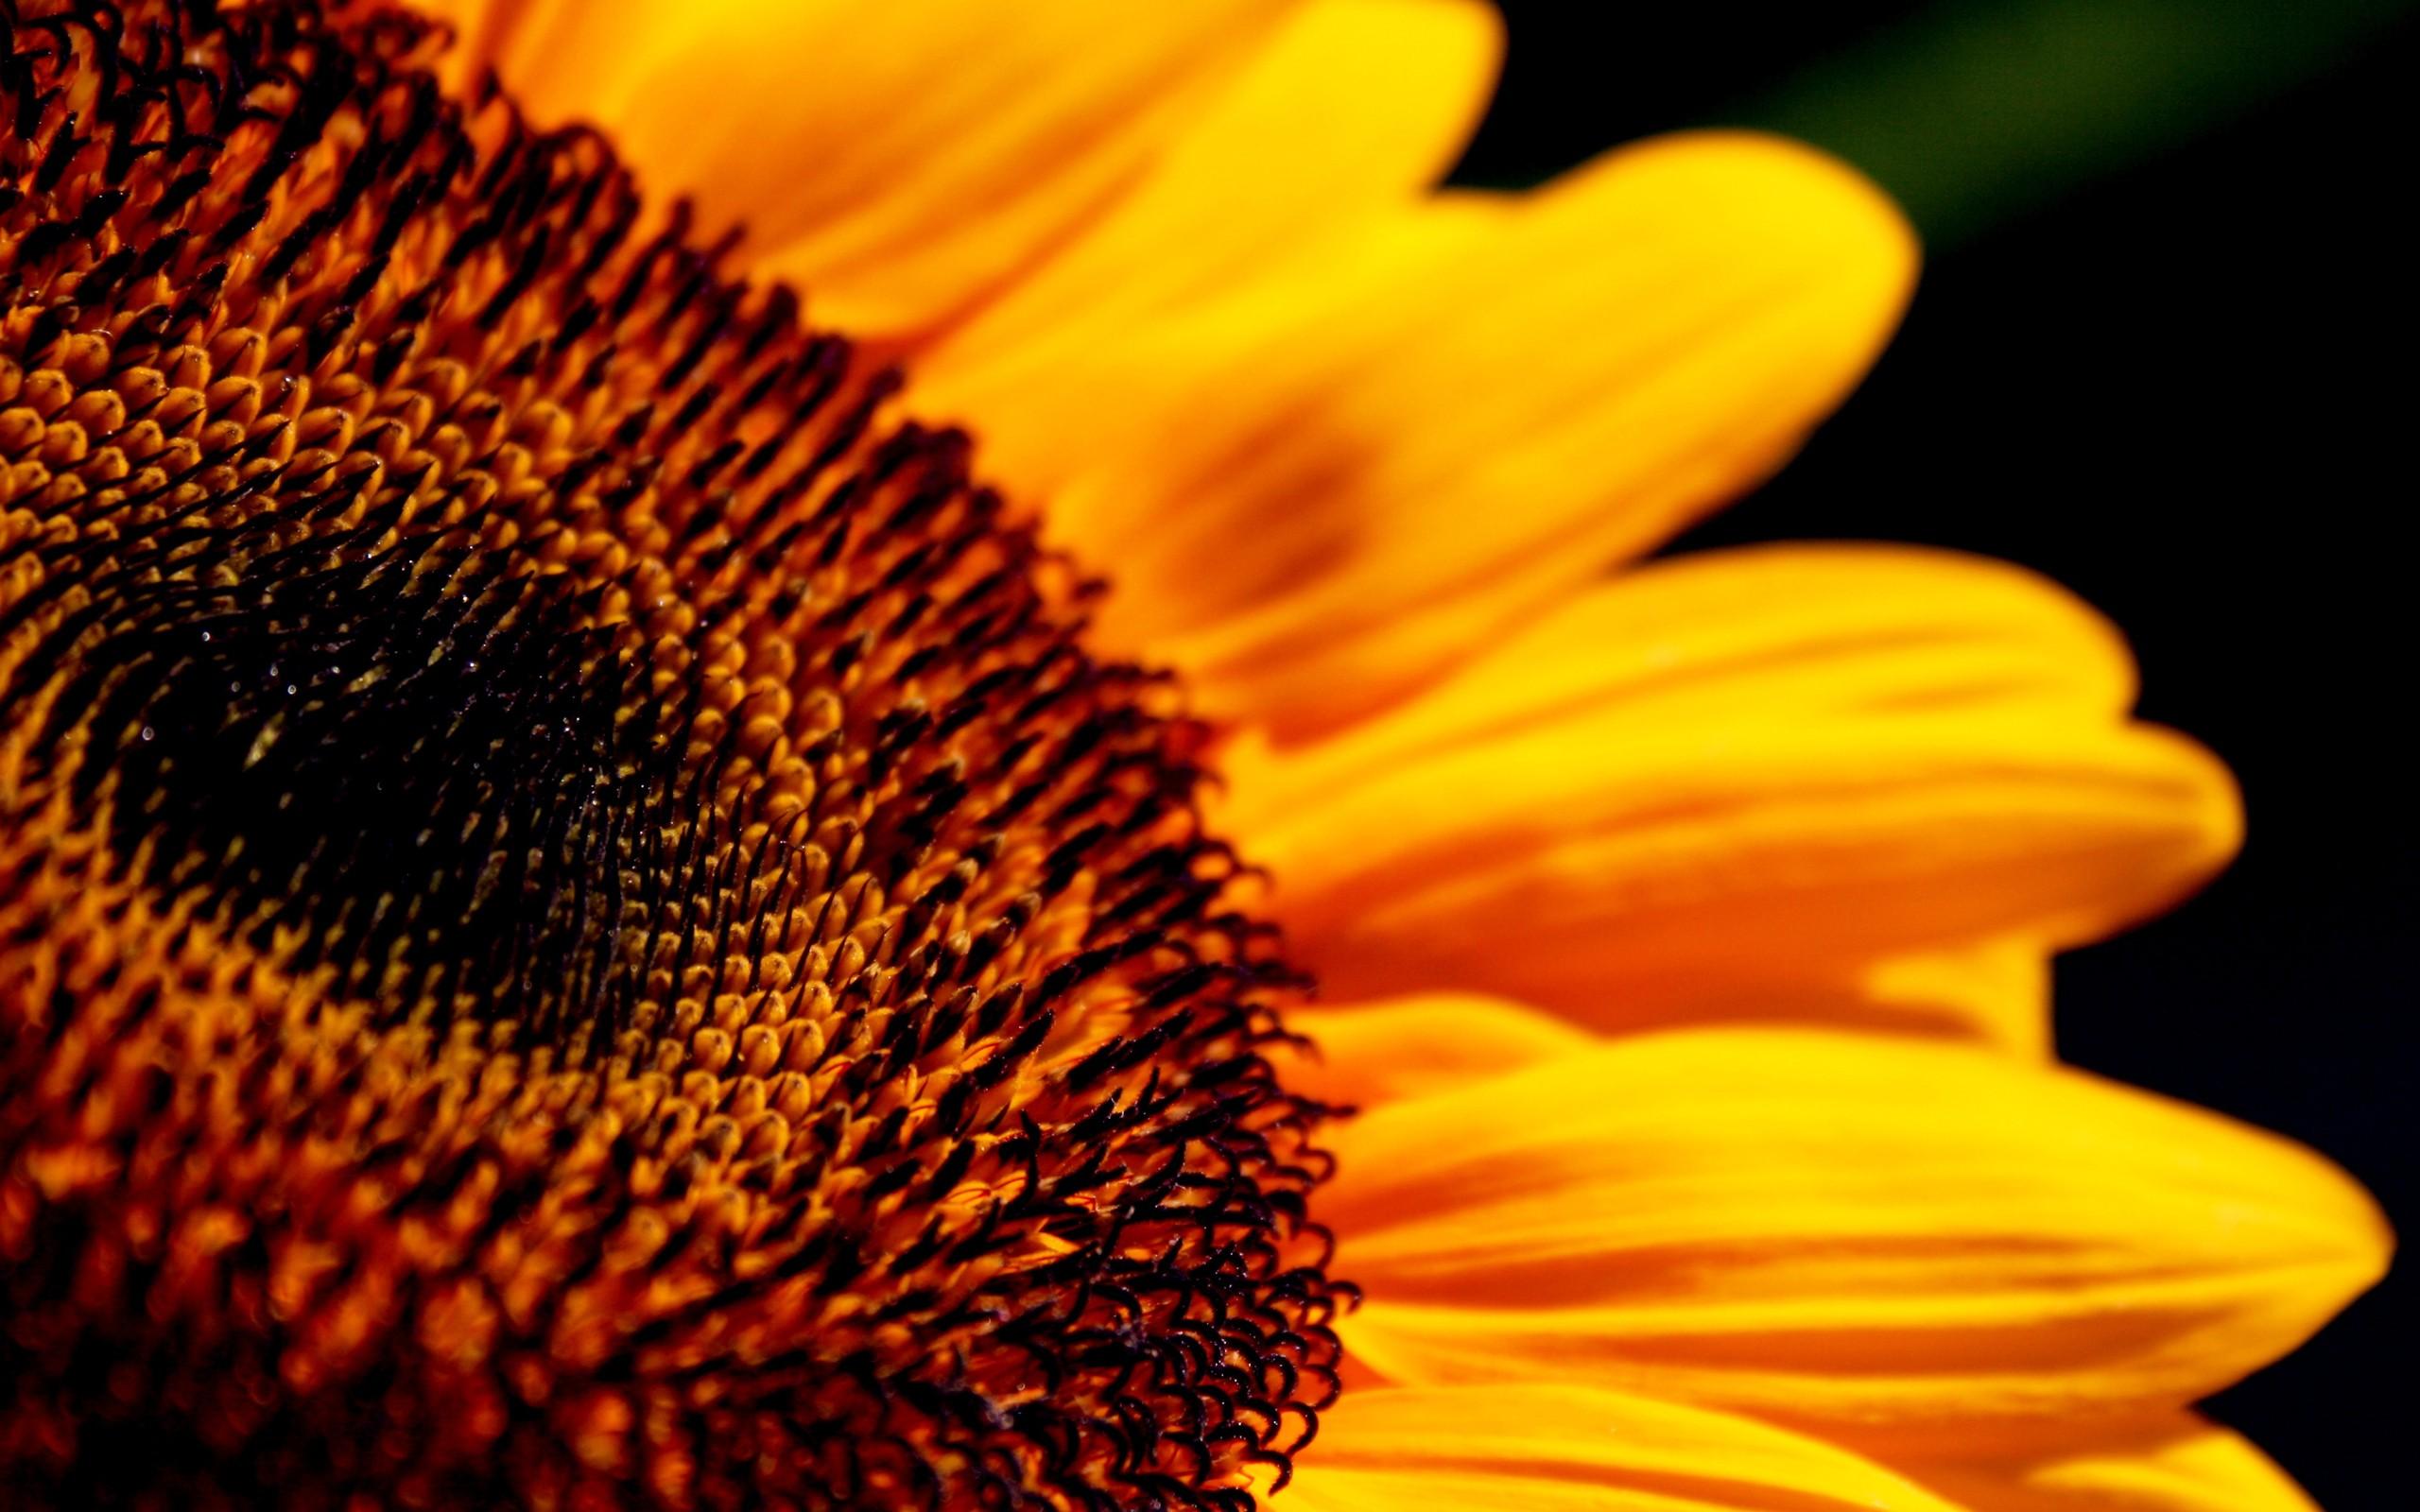 ErdeNatur Sonnenblume Blume Wallpaper